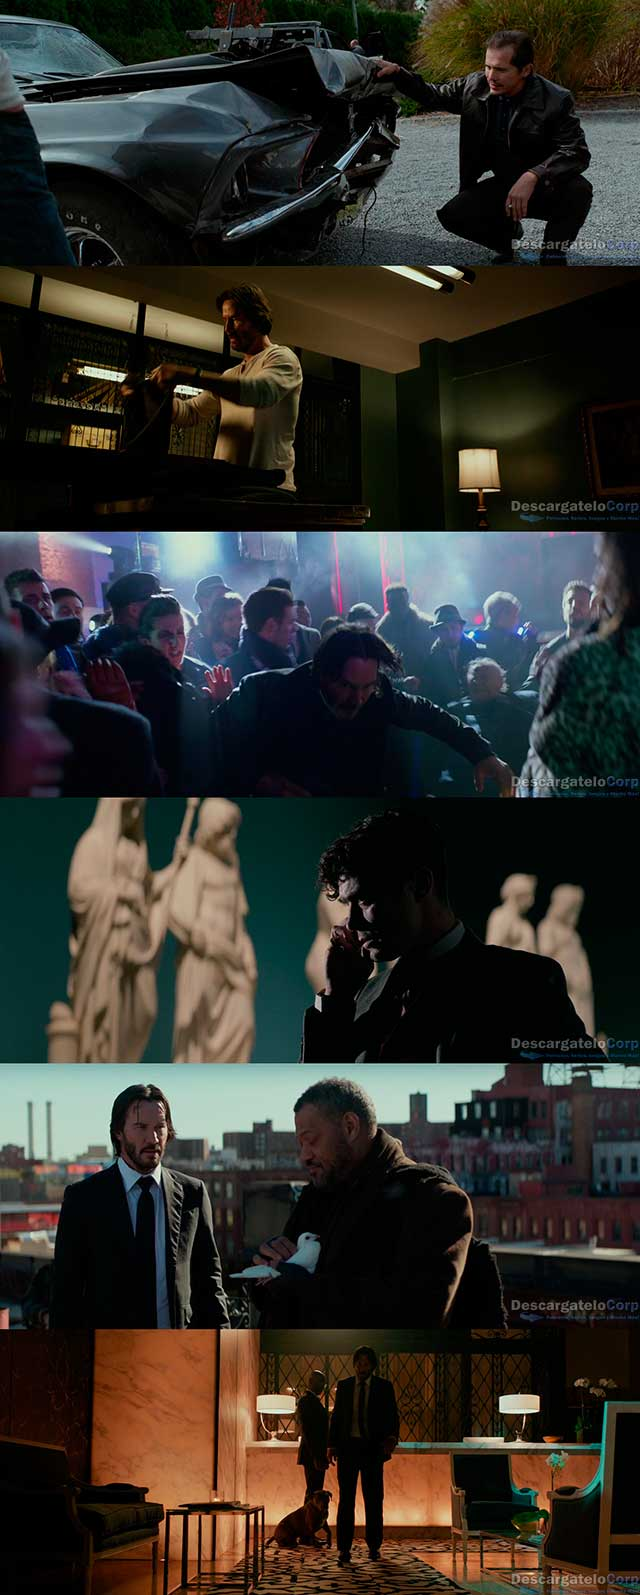 John Wick 2 Un Nuevo Día para Matar (2017) 4K UHD Latino Dual